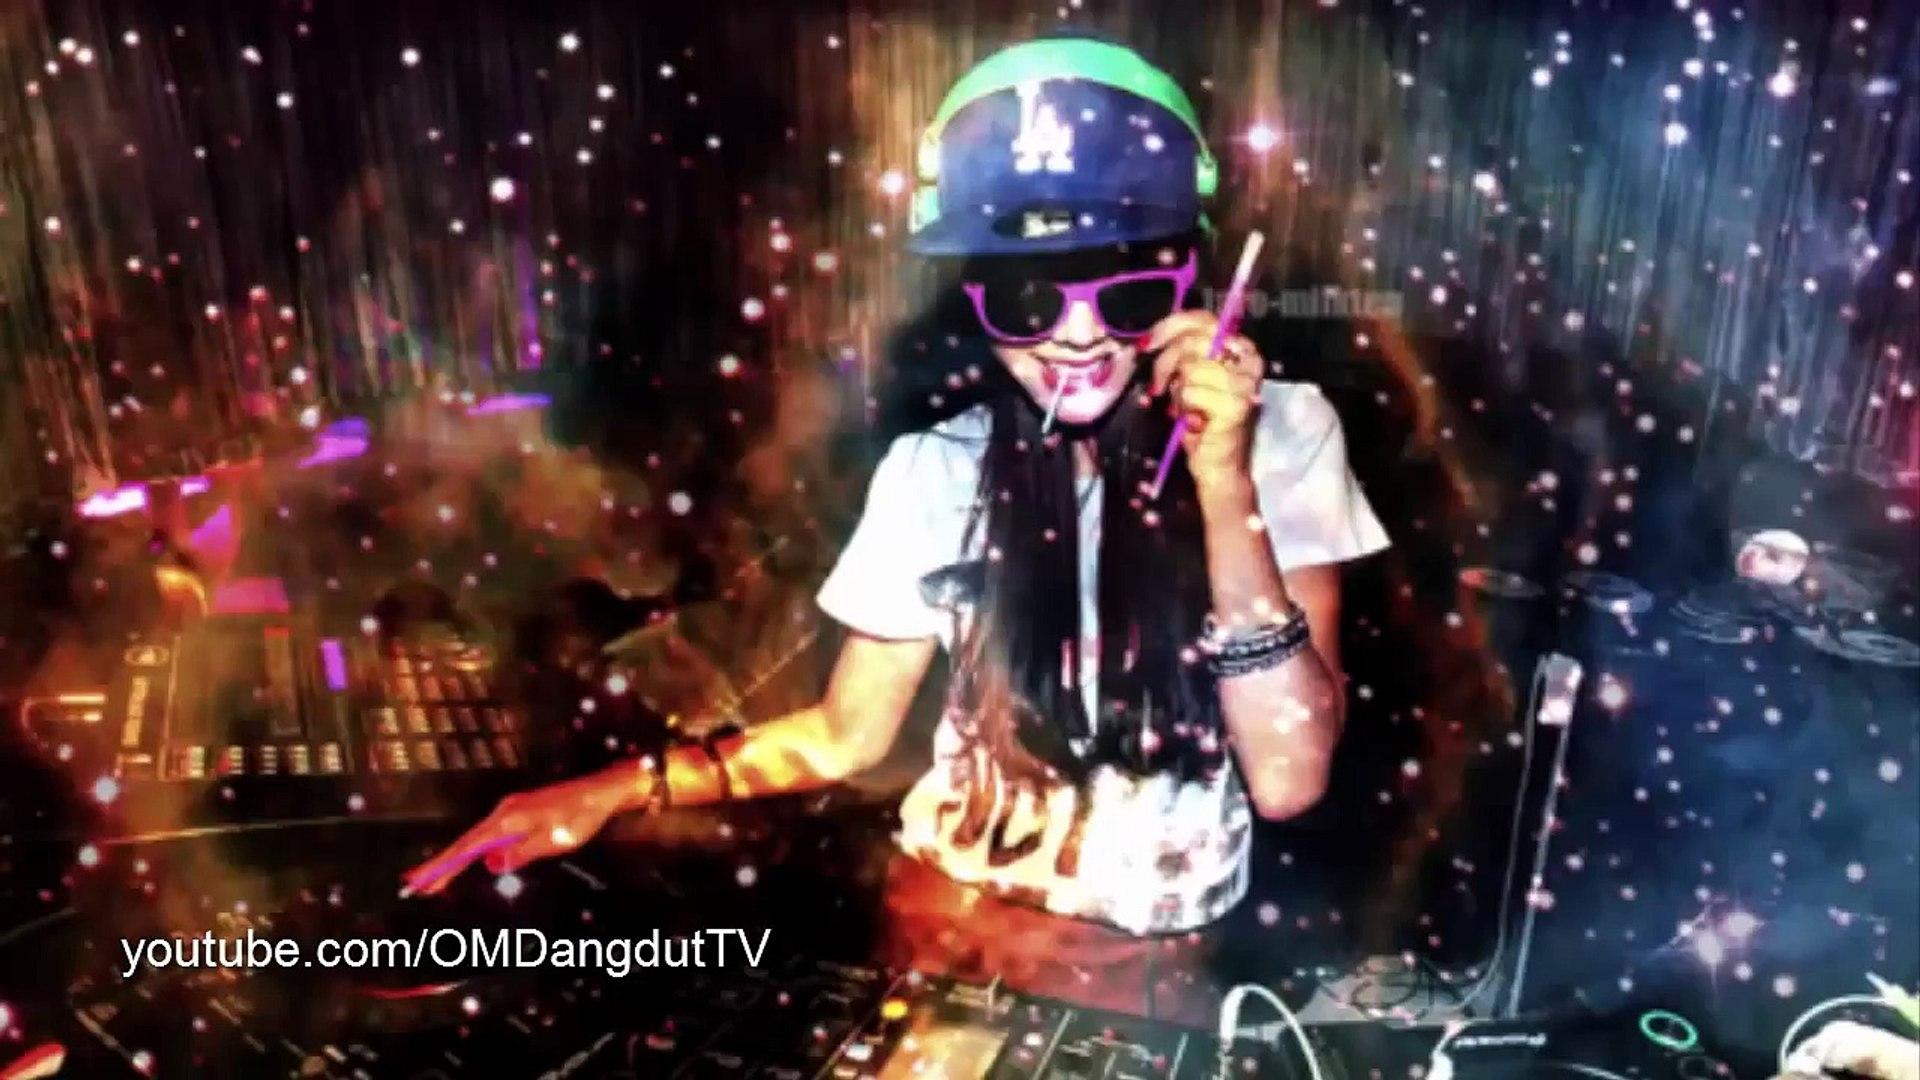 House Music 2015 - DJ Terbaru 2015 - Dance mix 2015